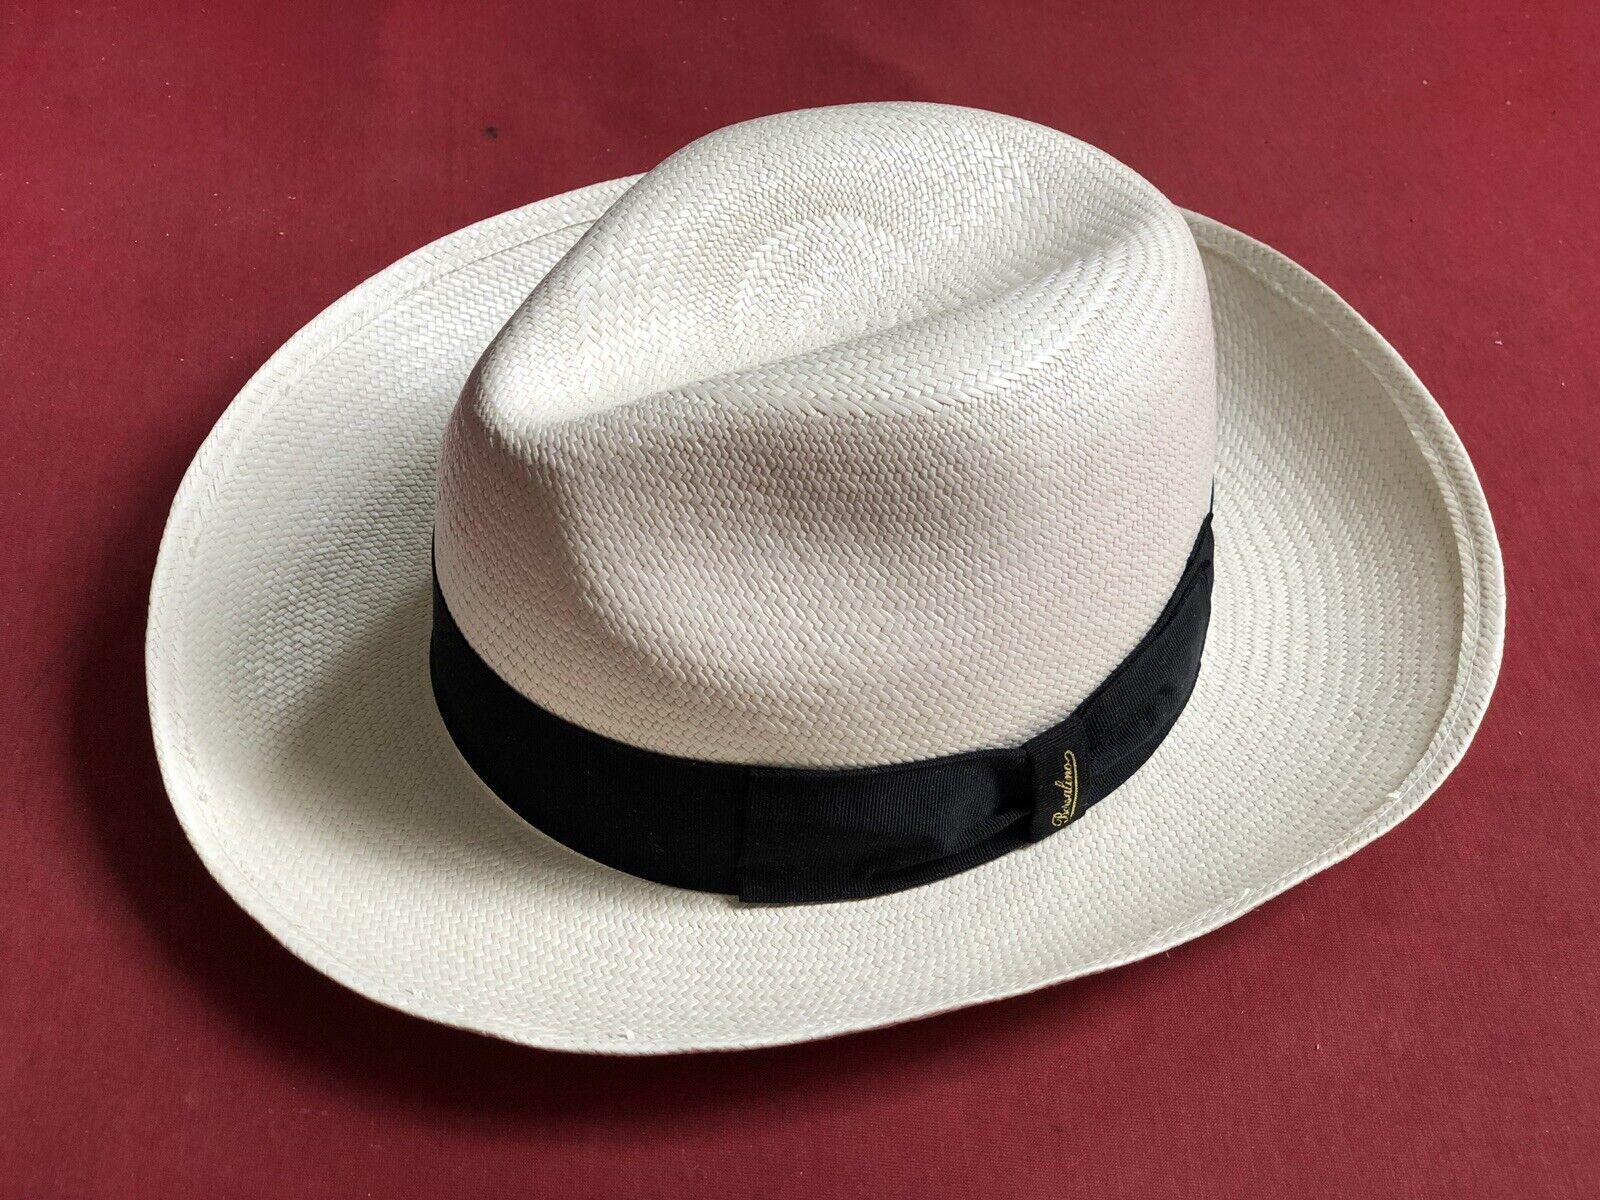 BORSALINO Herren Strohhut Panamahut breite Krempe Gr.58 mens straw hat traveller